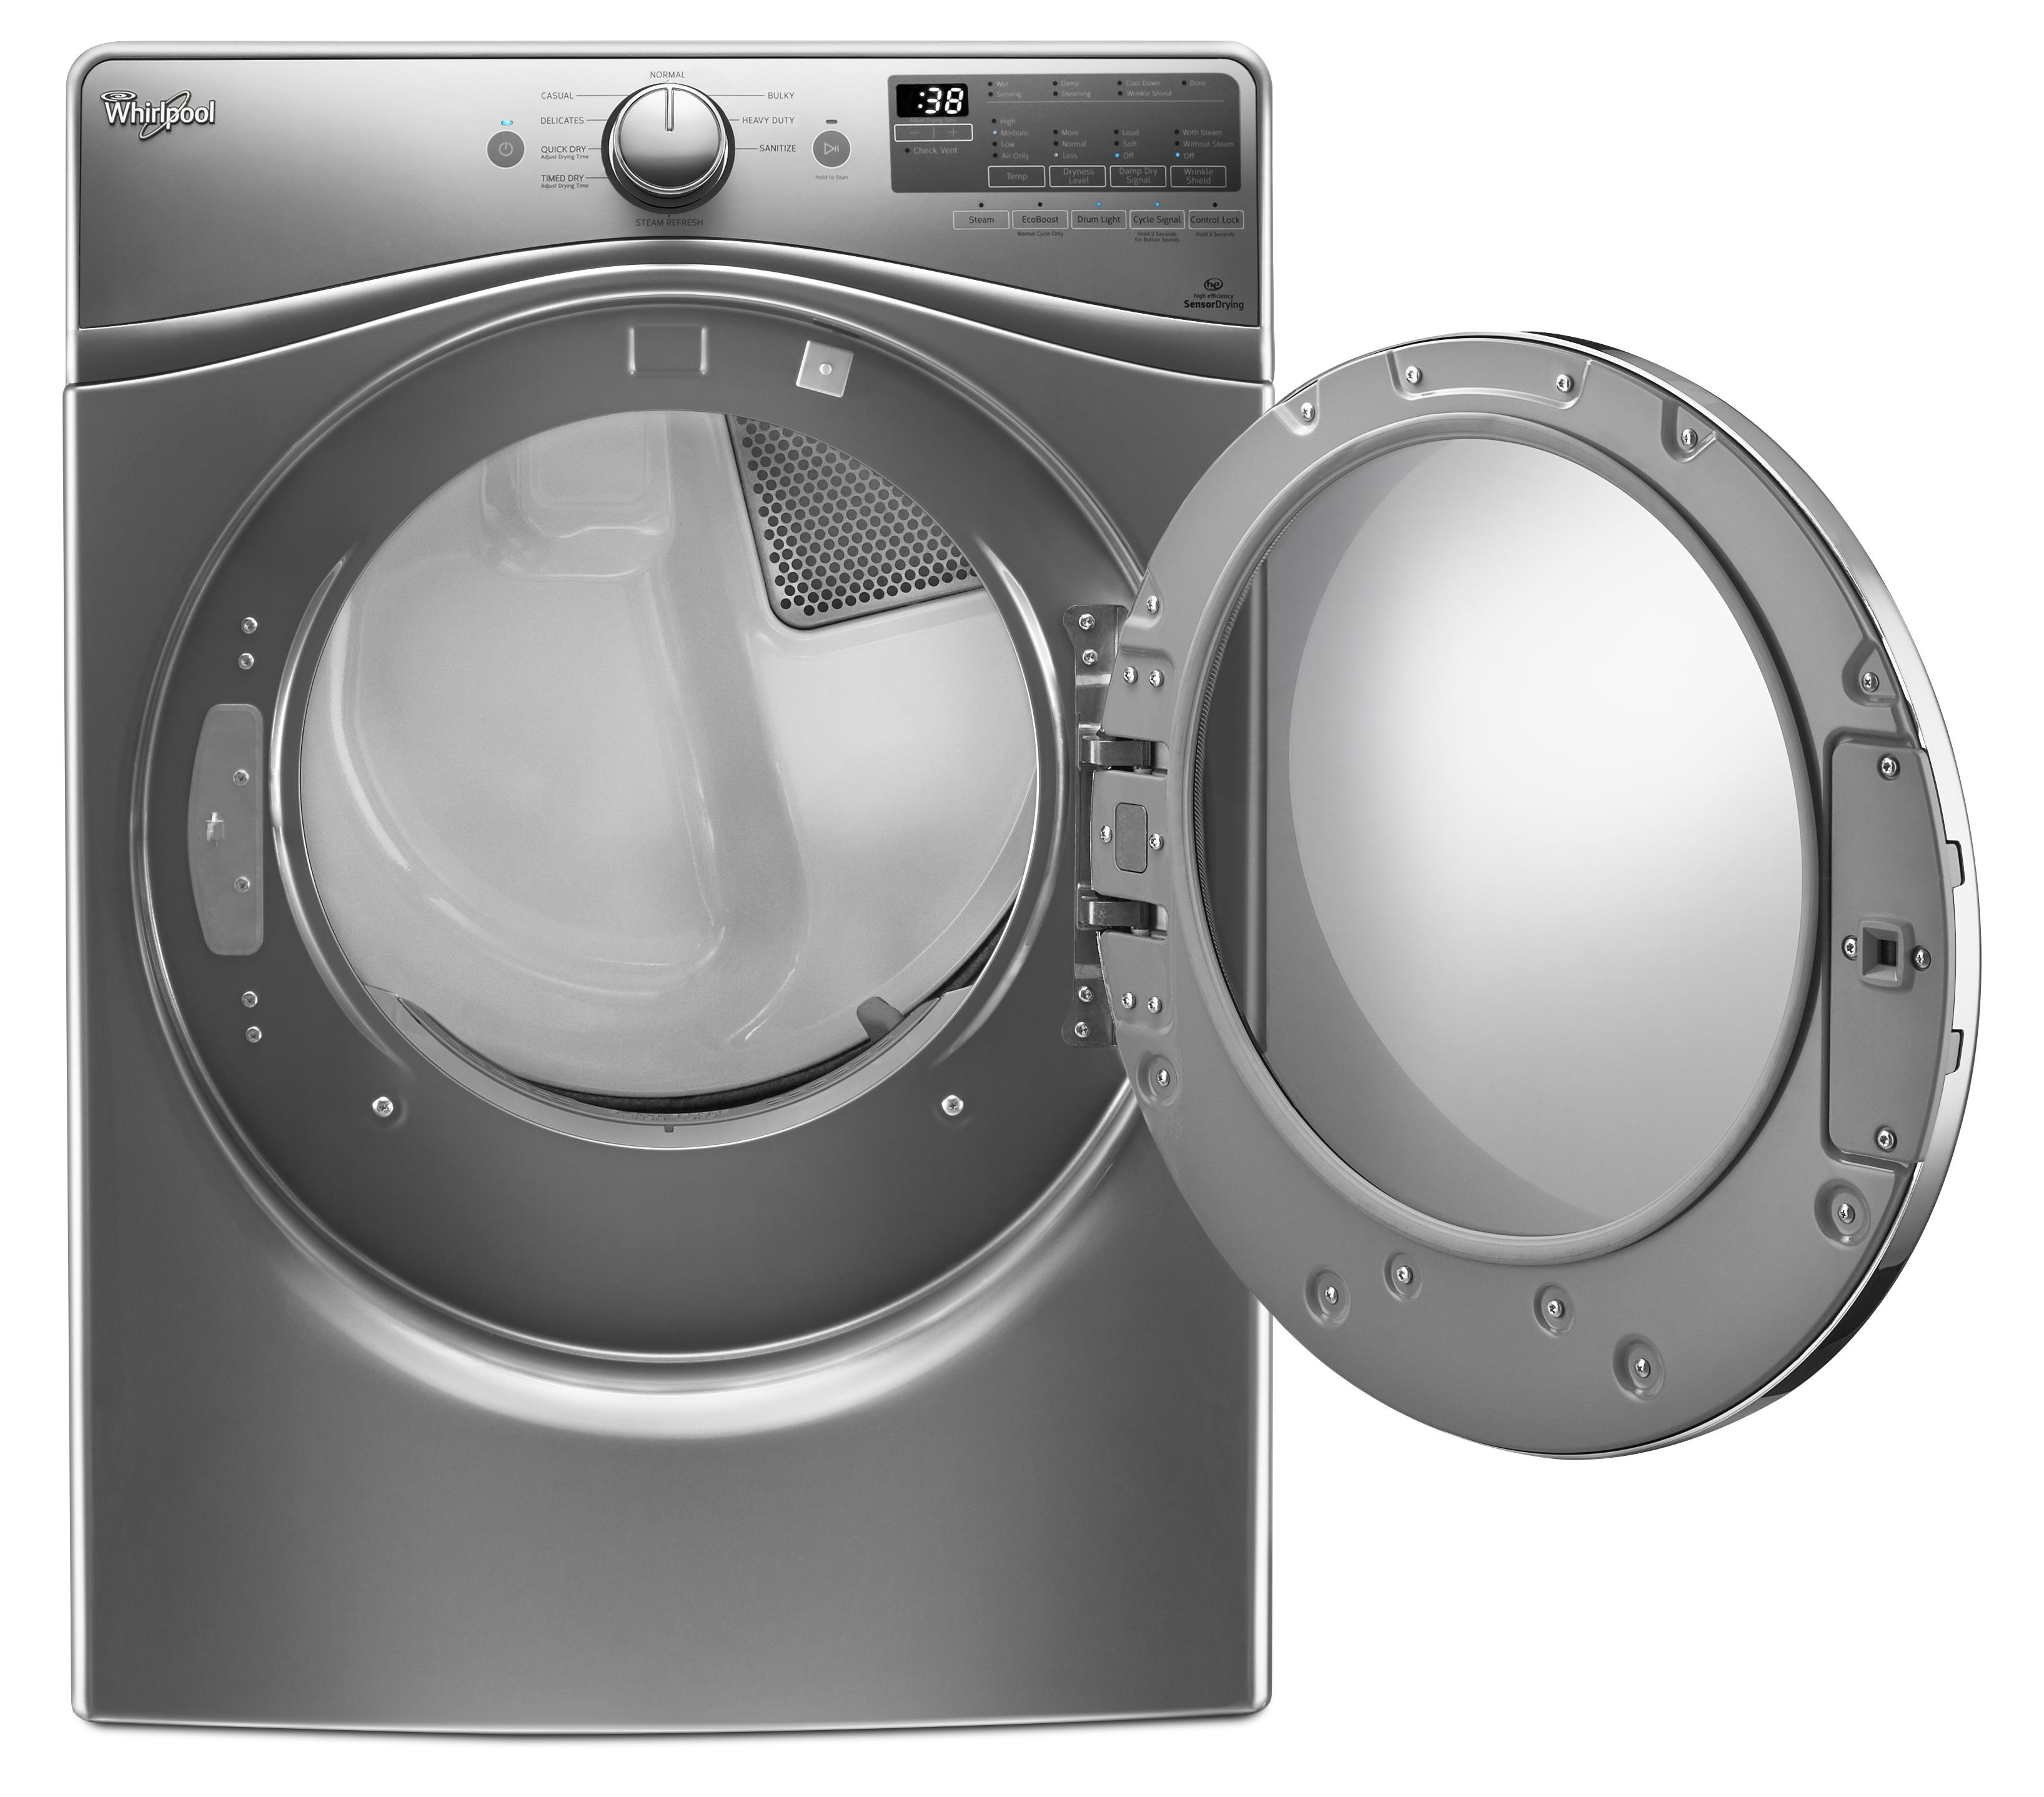 Whirlpool WED90HEFC 7.4 cu. ft. Electric Dryer - Chrome Shadow